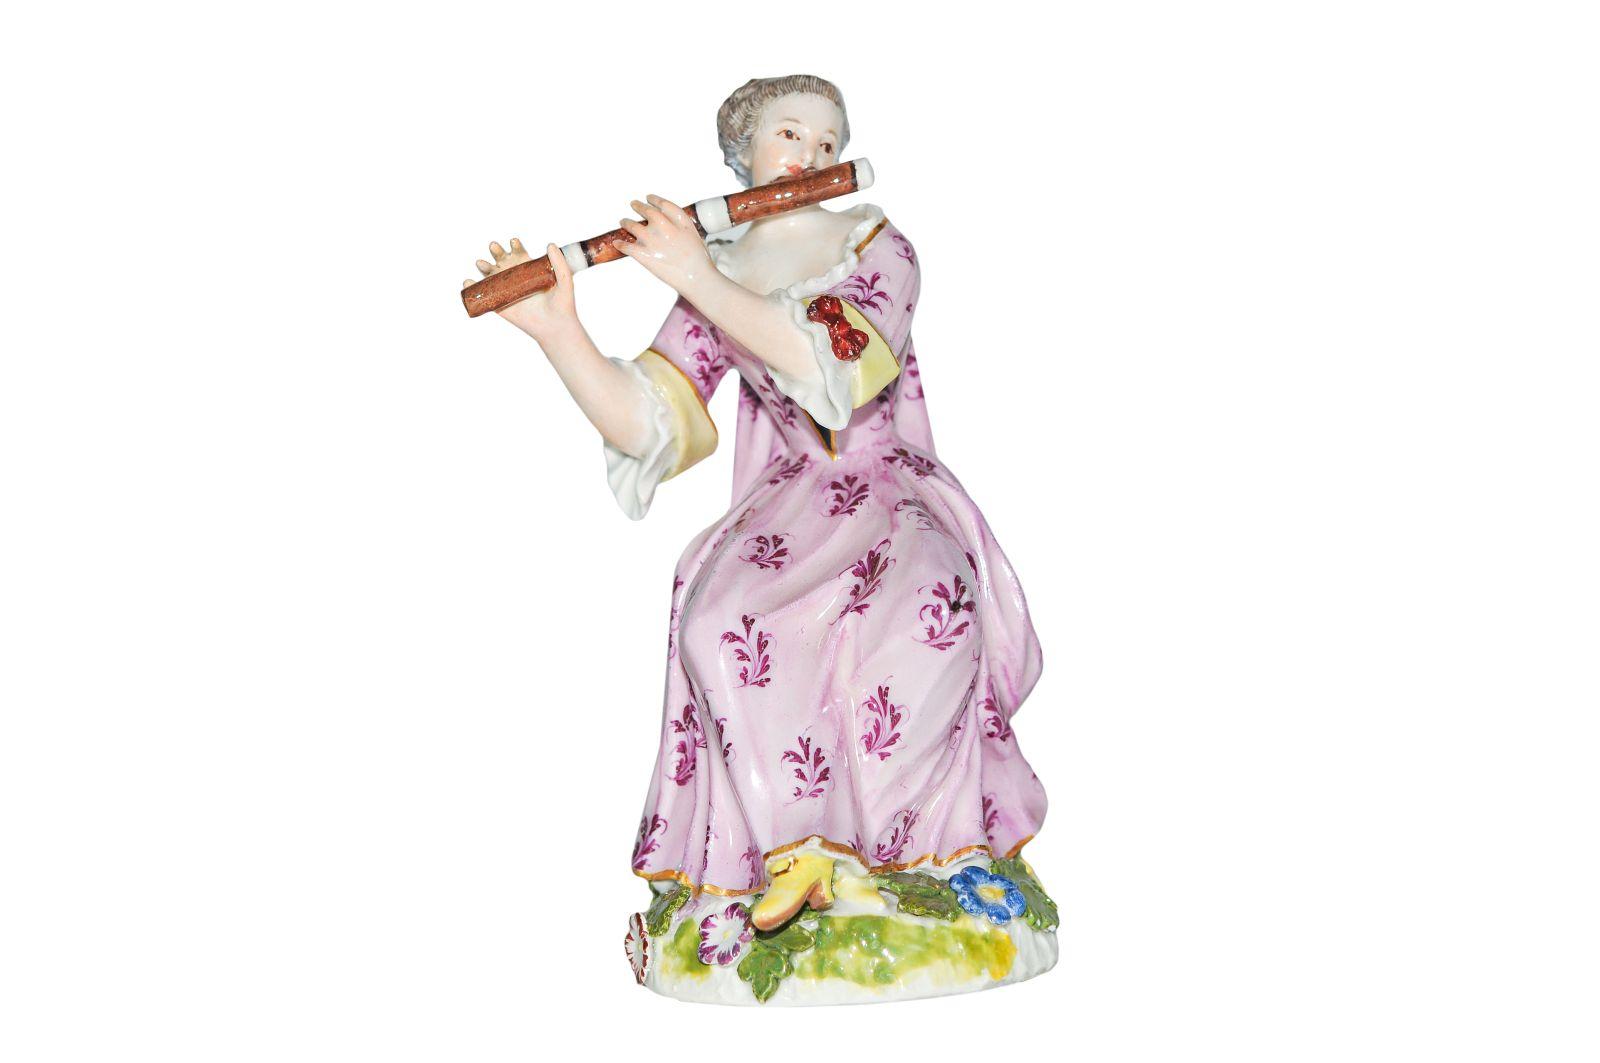 #200 Flute player Meissen 1750 | Flötenspielerin Meissen 1750 Image